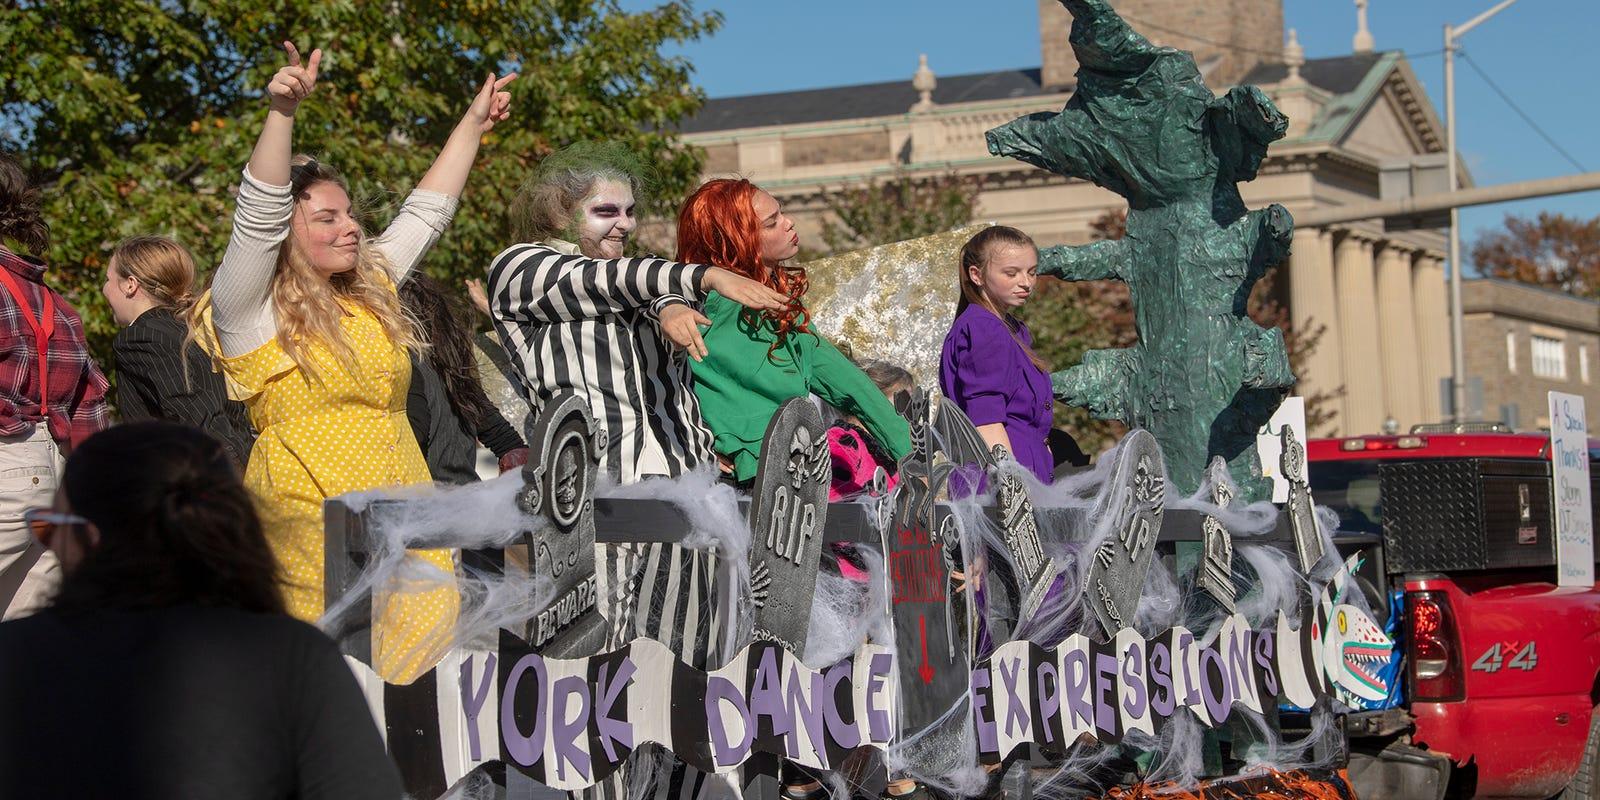 Dover Pa 2020 Halloween Parade Halloween 2020: Coronavirus cancels York County parades